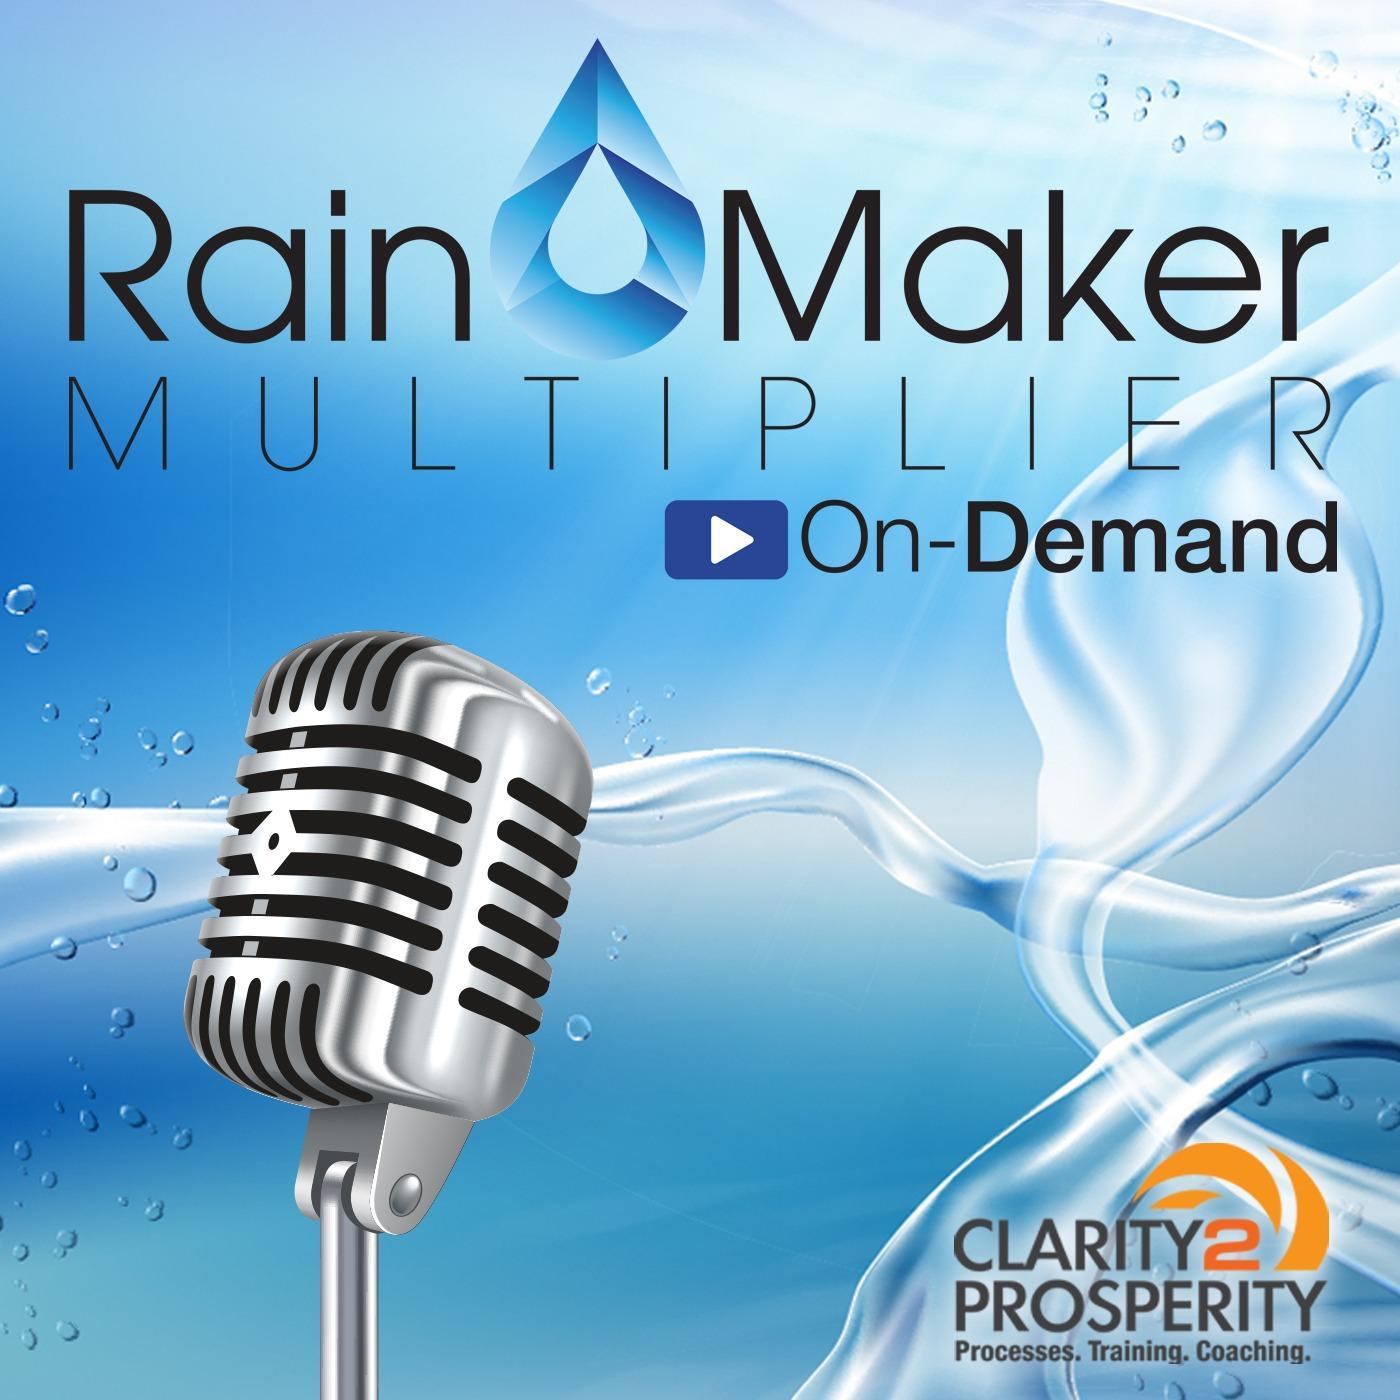 Rainmaker Multiplier On-Demand